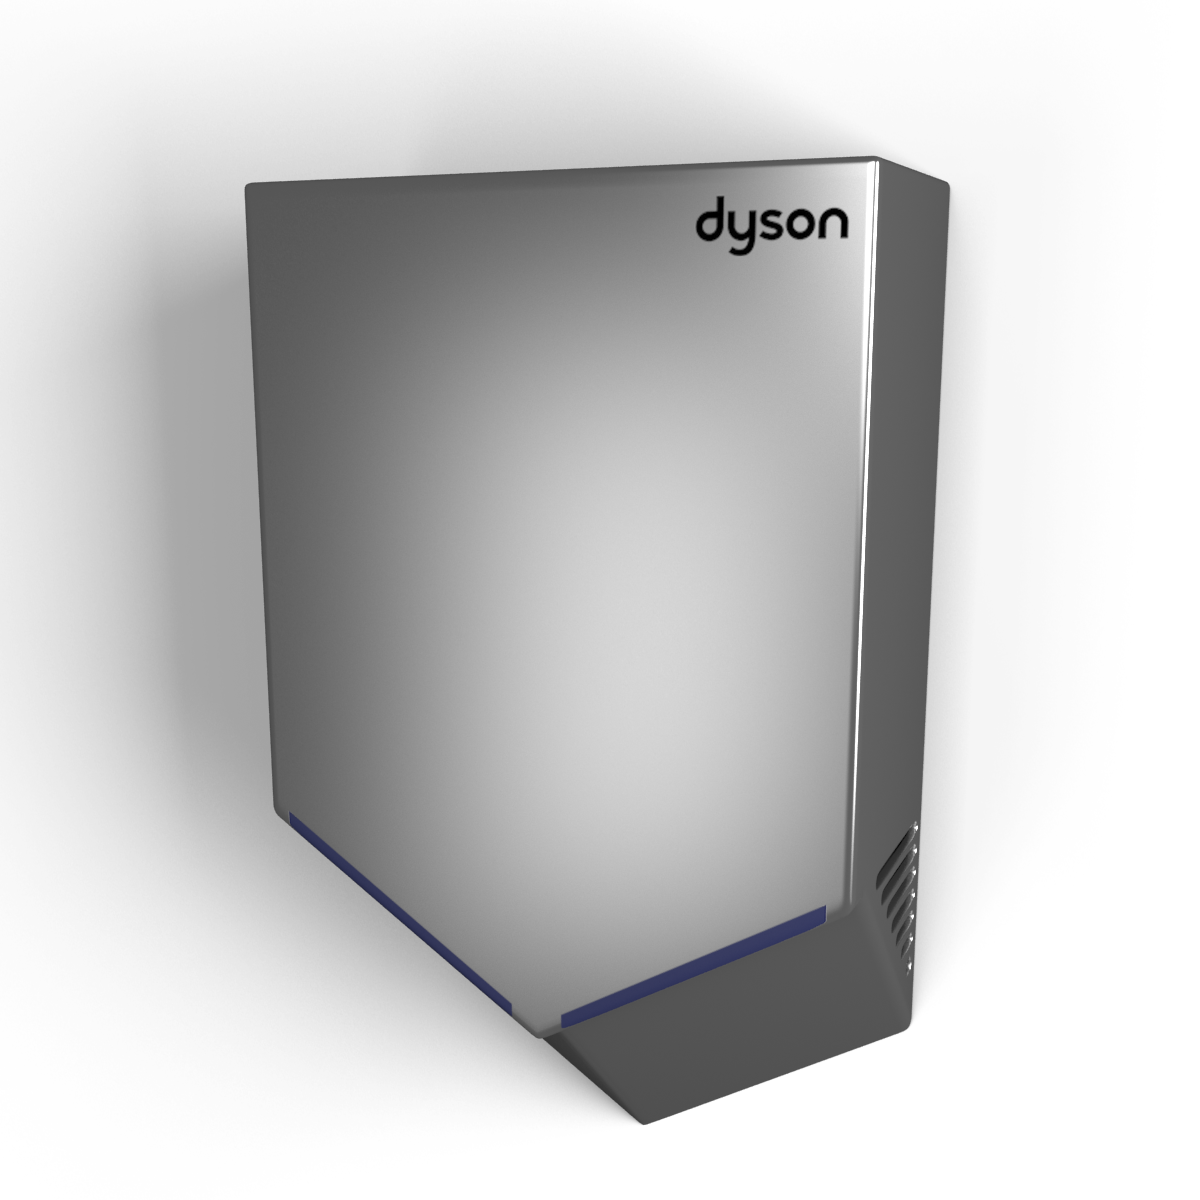 dyson airblade v 3d model - Dyson Airblade V